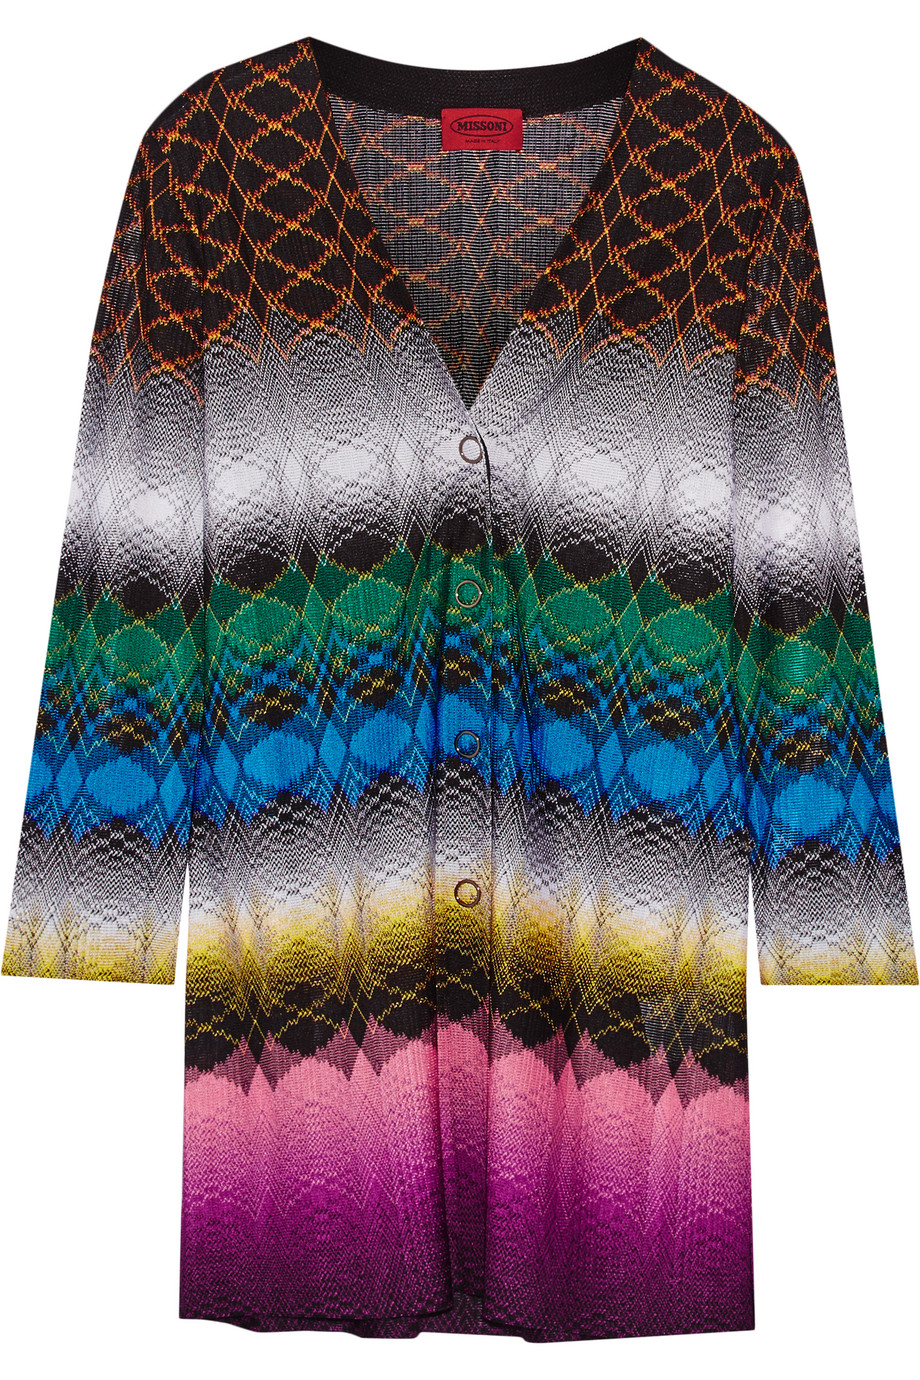 Missoni Crochet-Knit Cardigan, Black, Women's, Size: 42